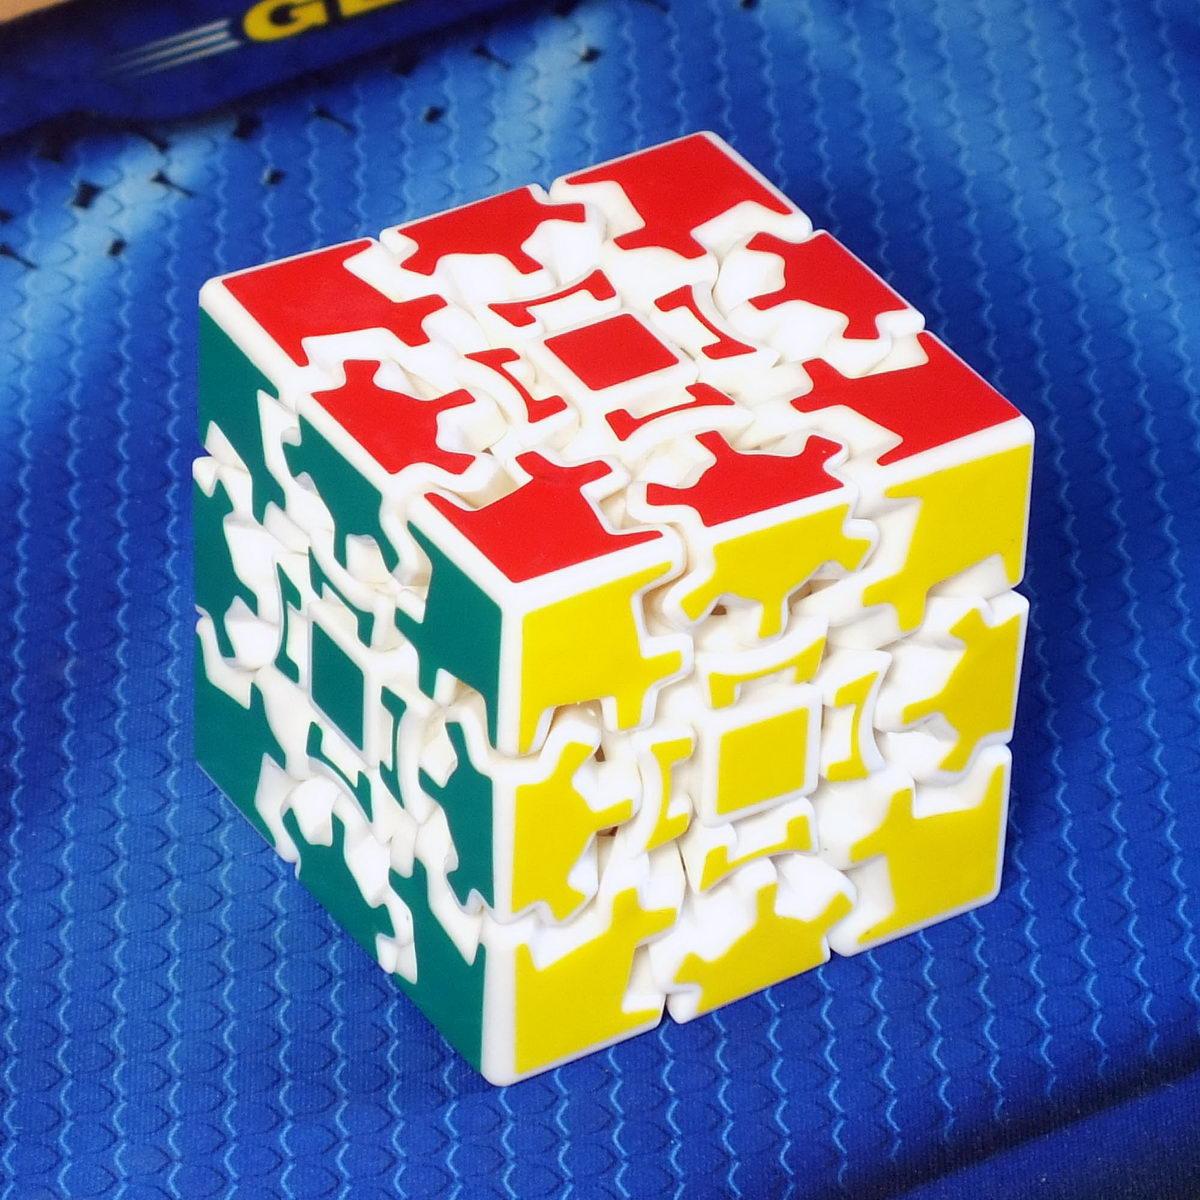 X-cube Gear Cube I white